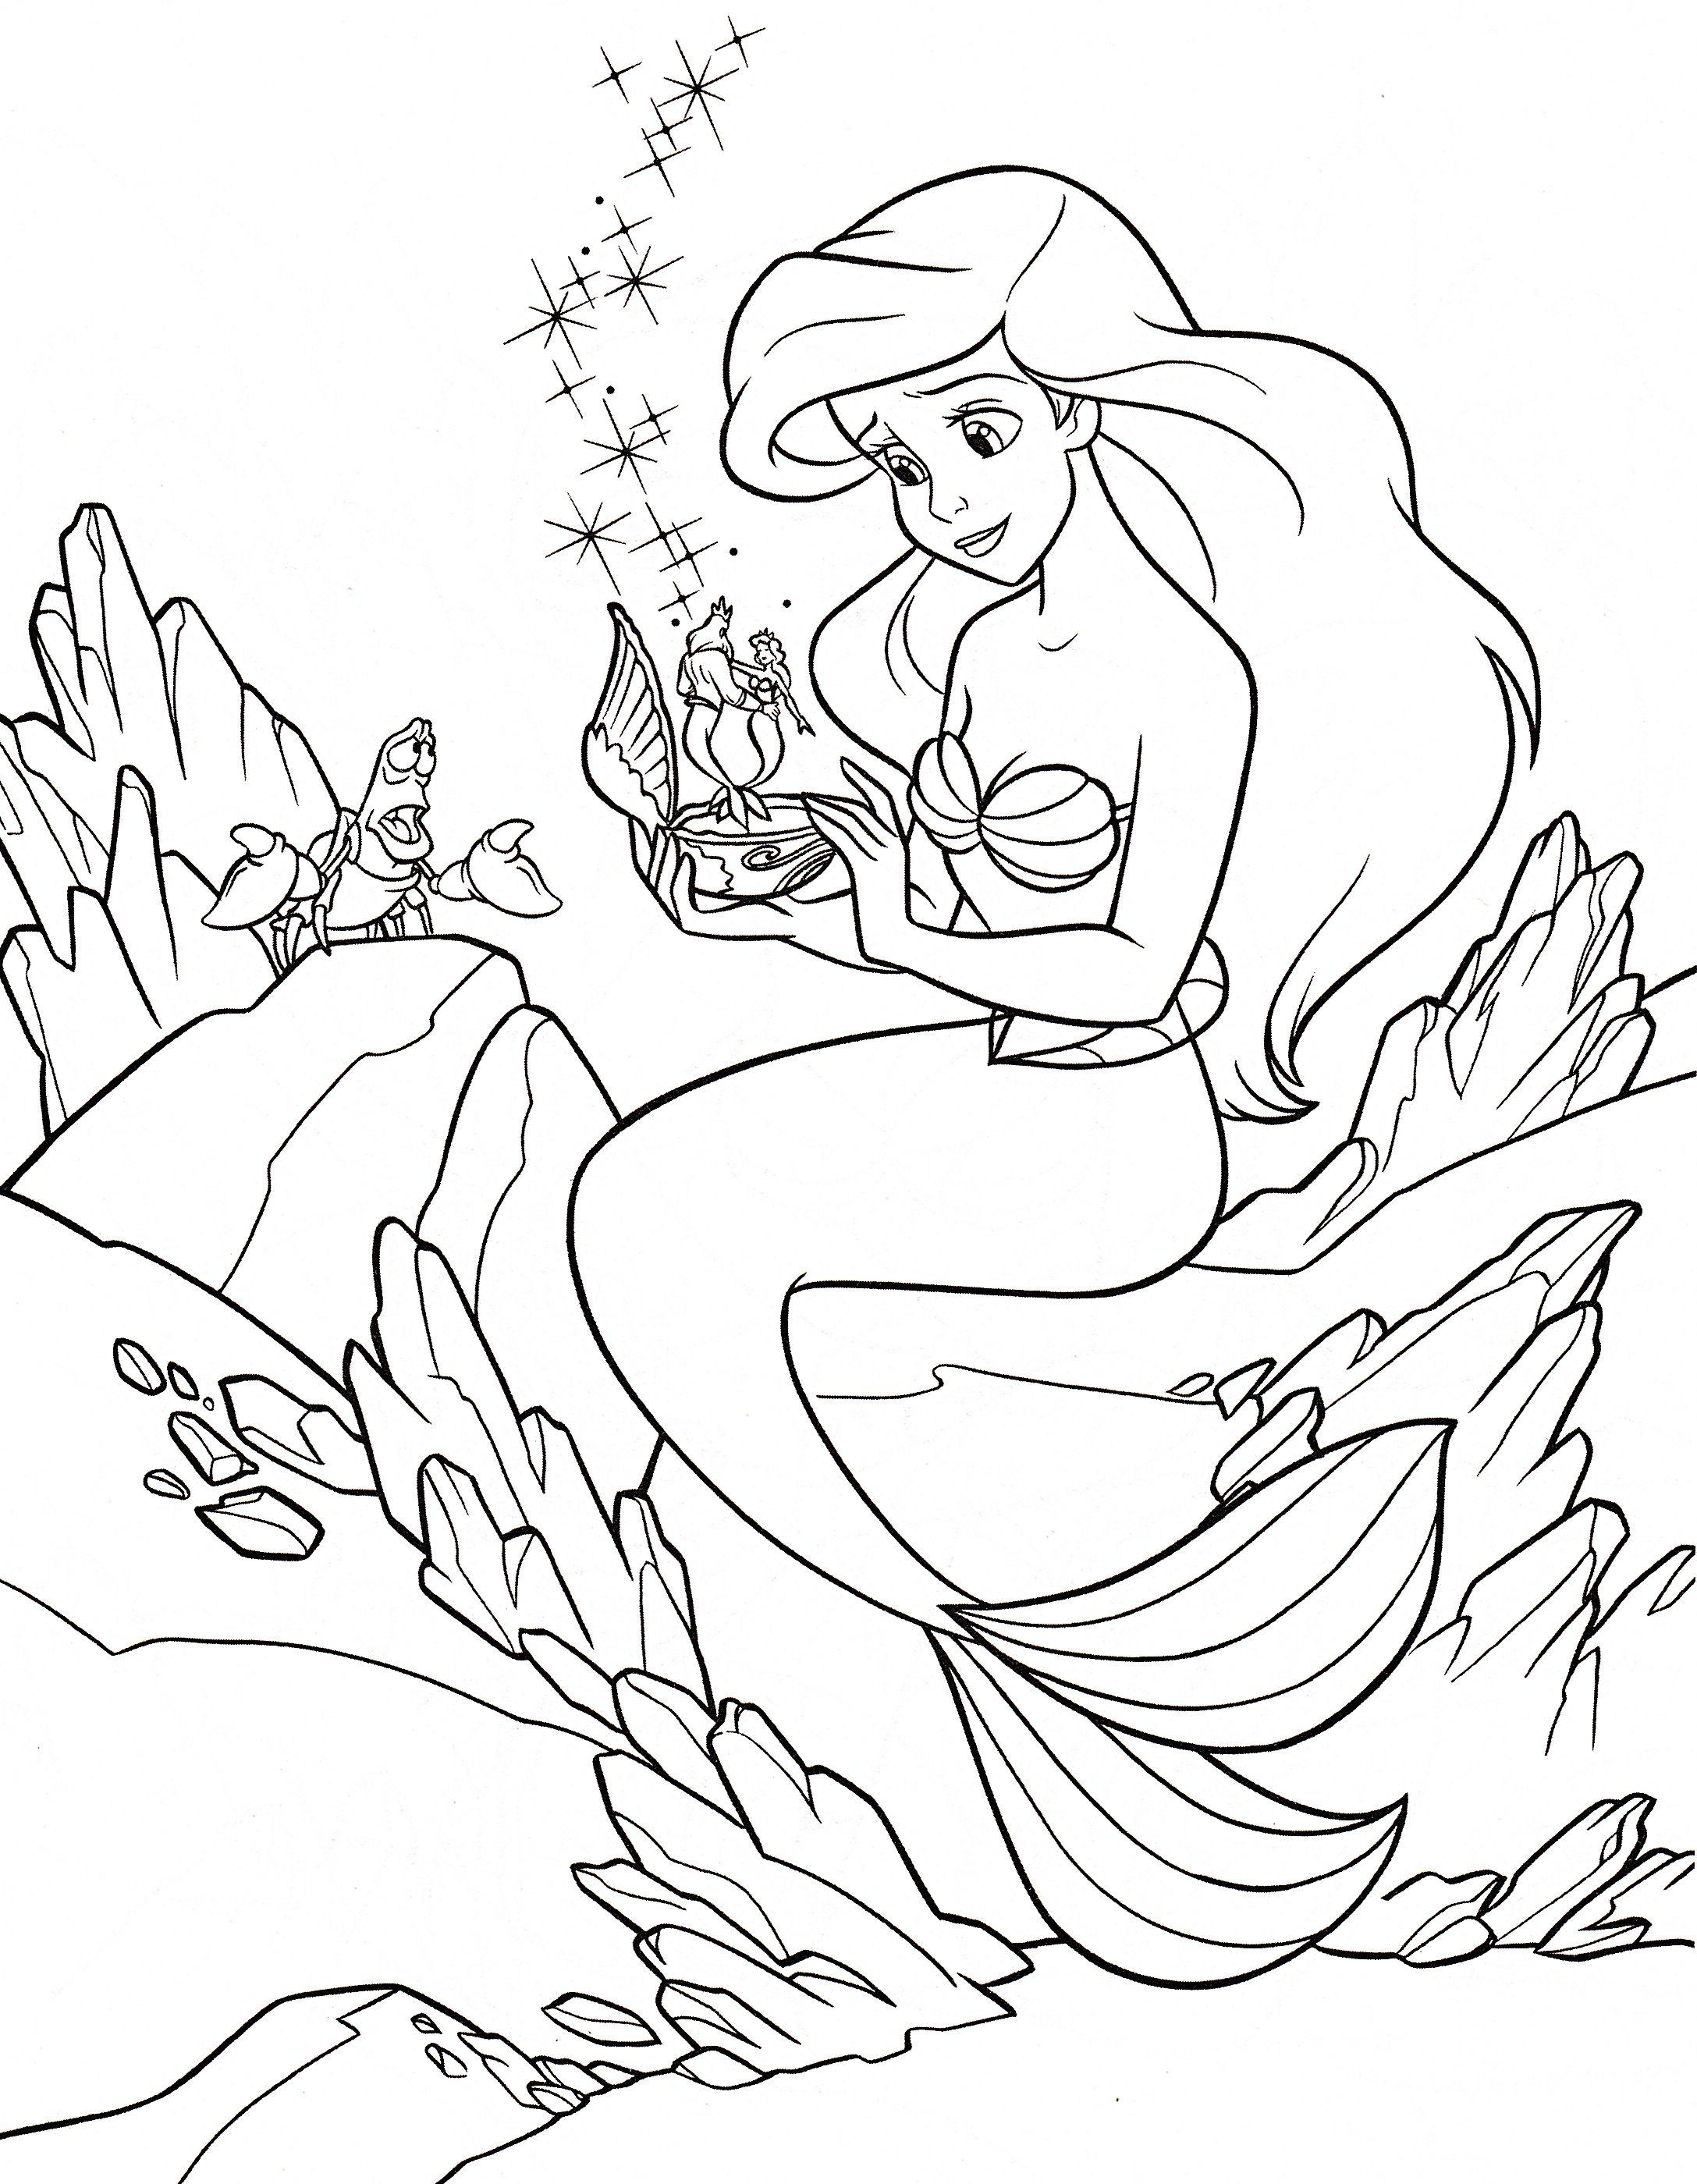 Walt Disney Characters Photo Walt Disney Coloring Pages Sebastian Princess Ariel Ariel Coloring Pages Disney Princess Coloring Pages Mermaid Coloring Book [ 2799 x 2175 Pixel ]